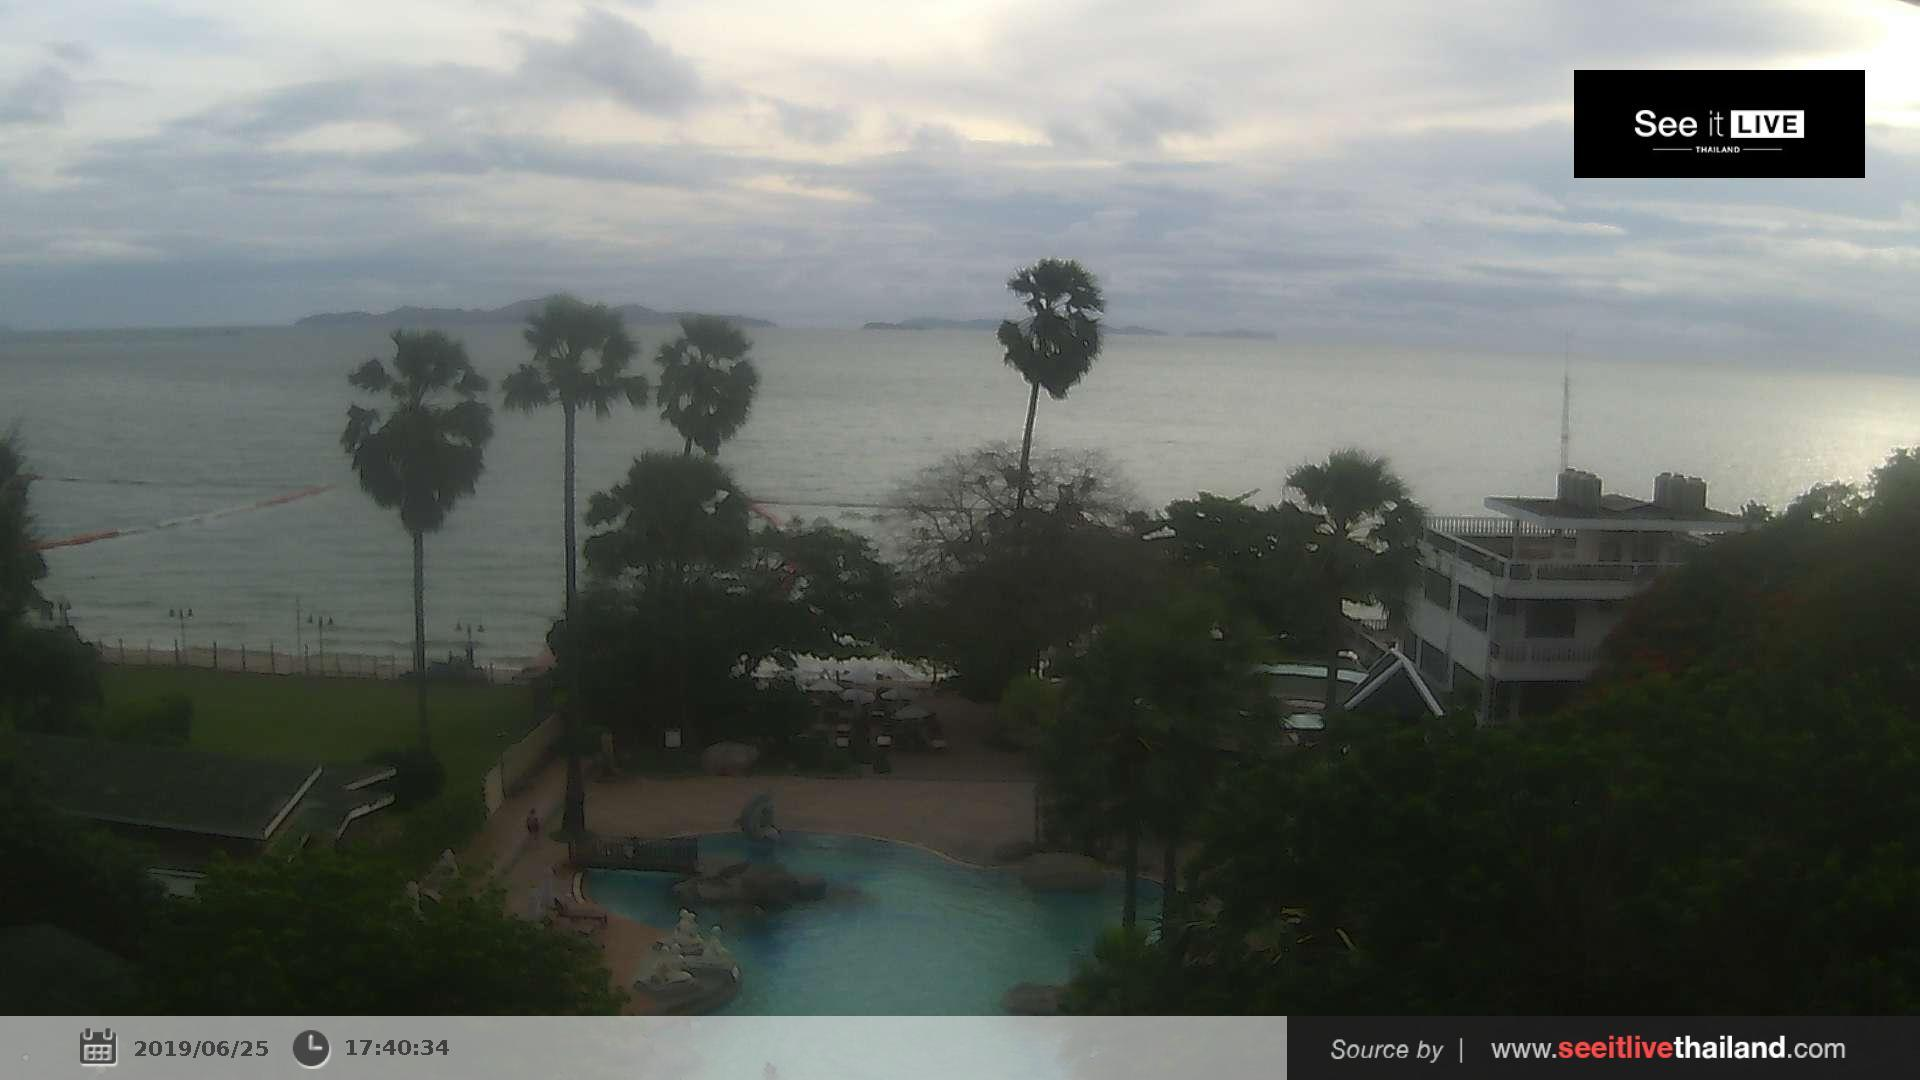 Webcam บ้านพัทยาเหนือ: Pattaya − Long Beach Garden Hotel